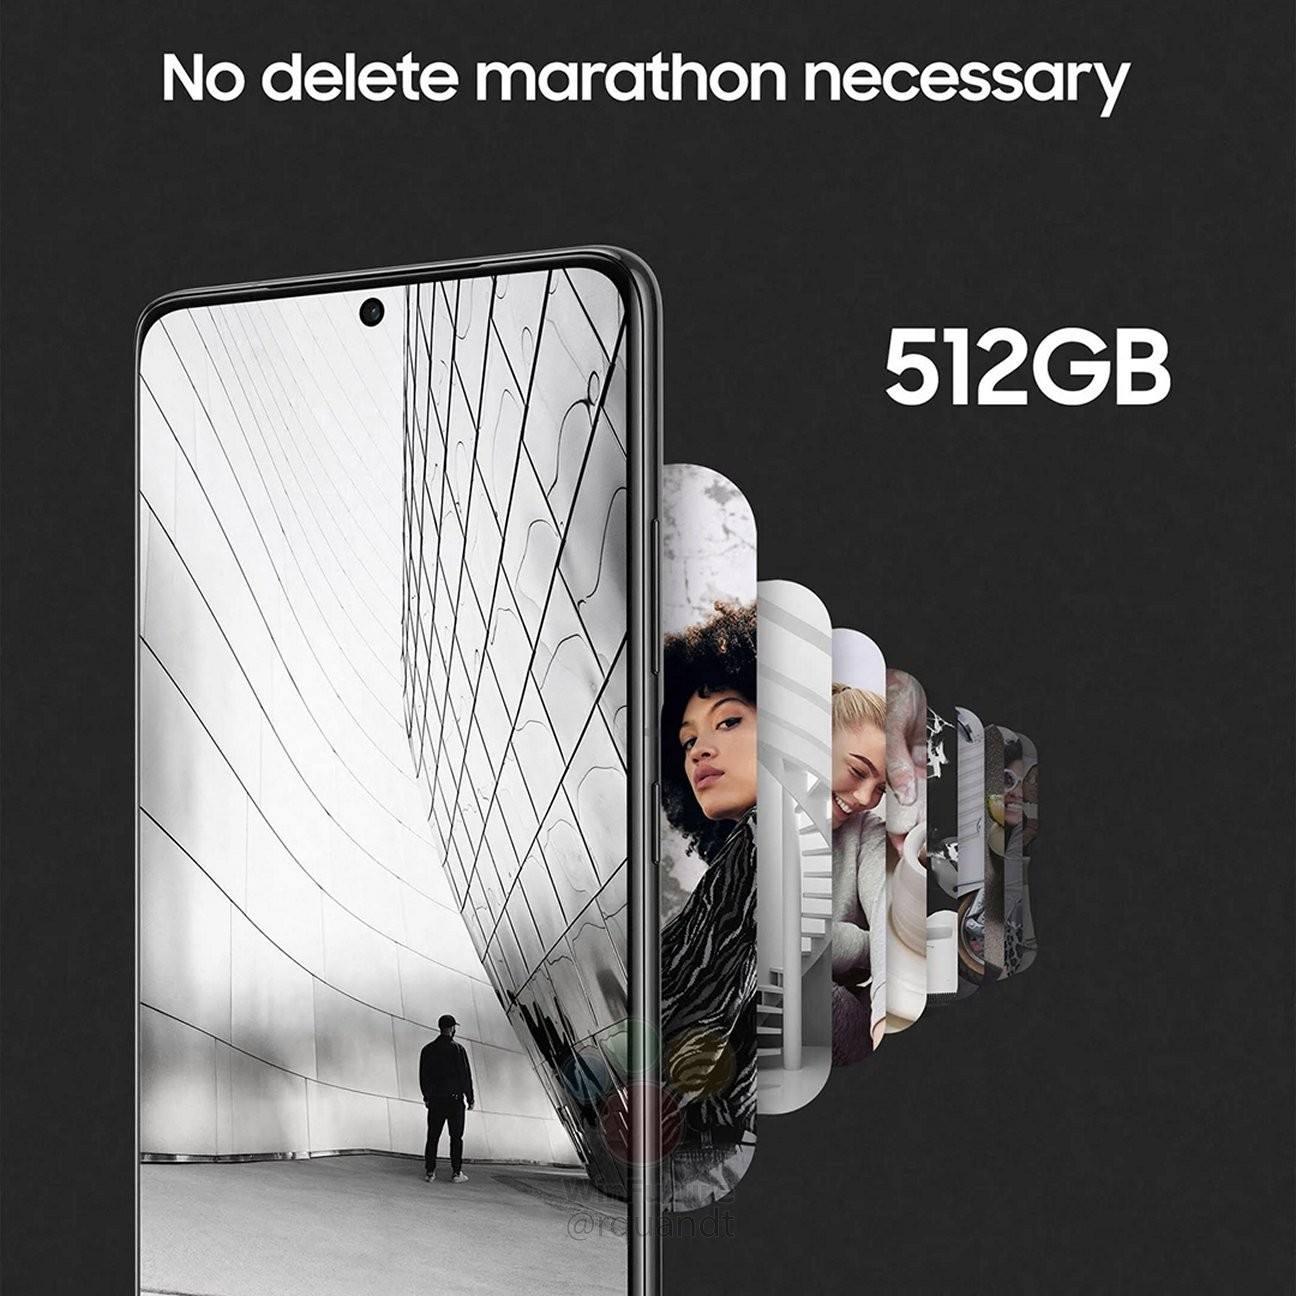 s21 5g 512gb